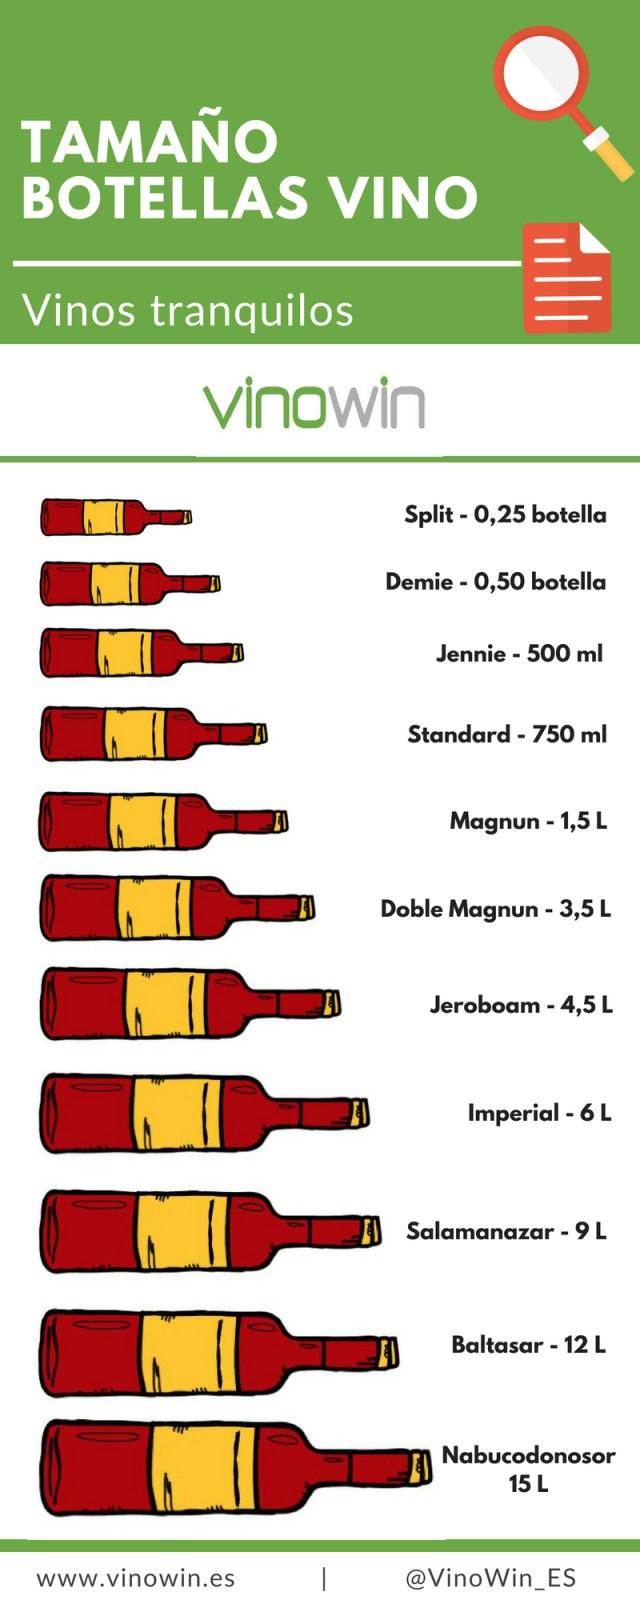 Tamaño botella vino